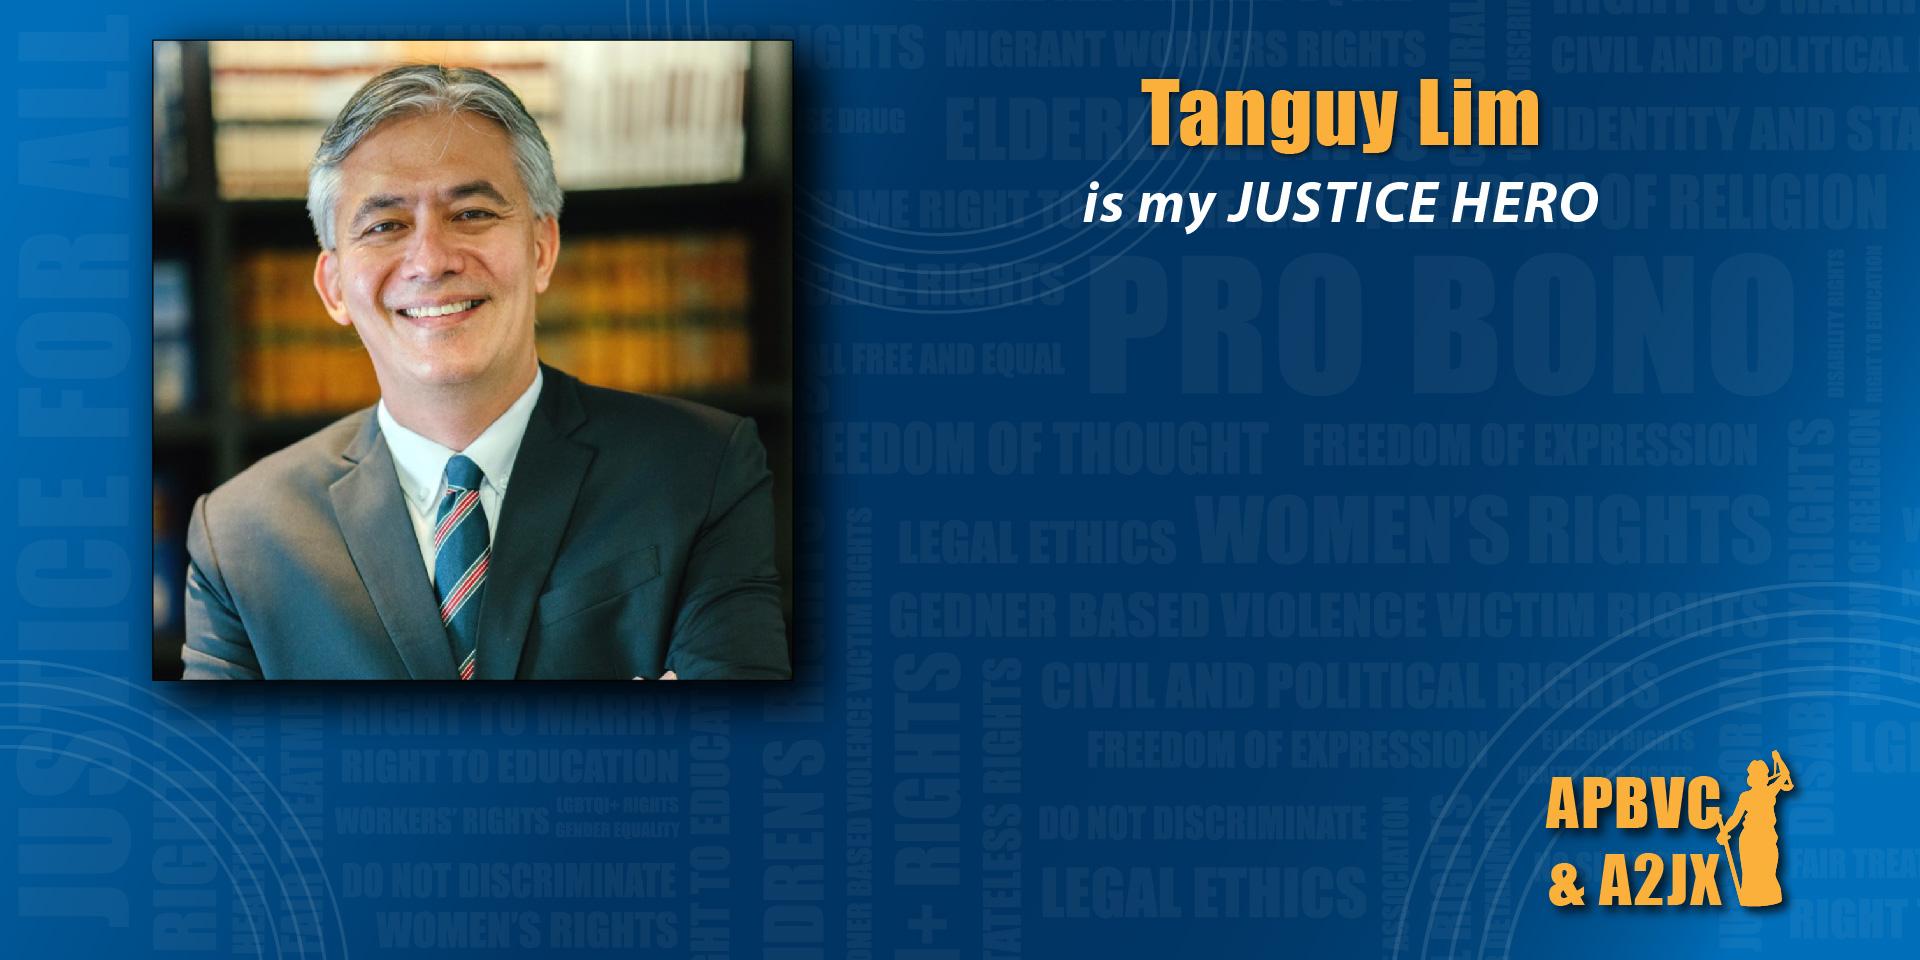 Tanguy Lim